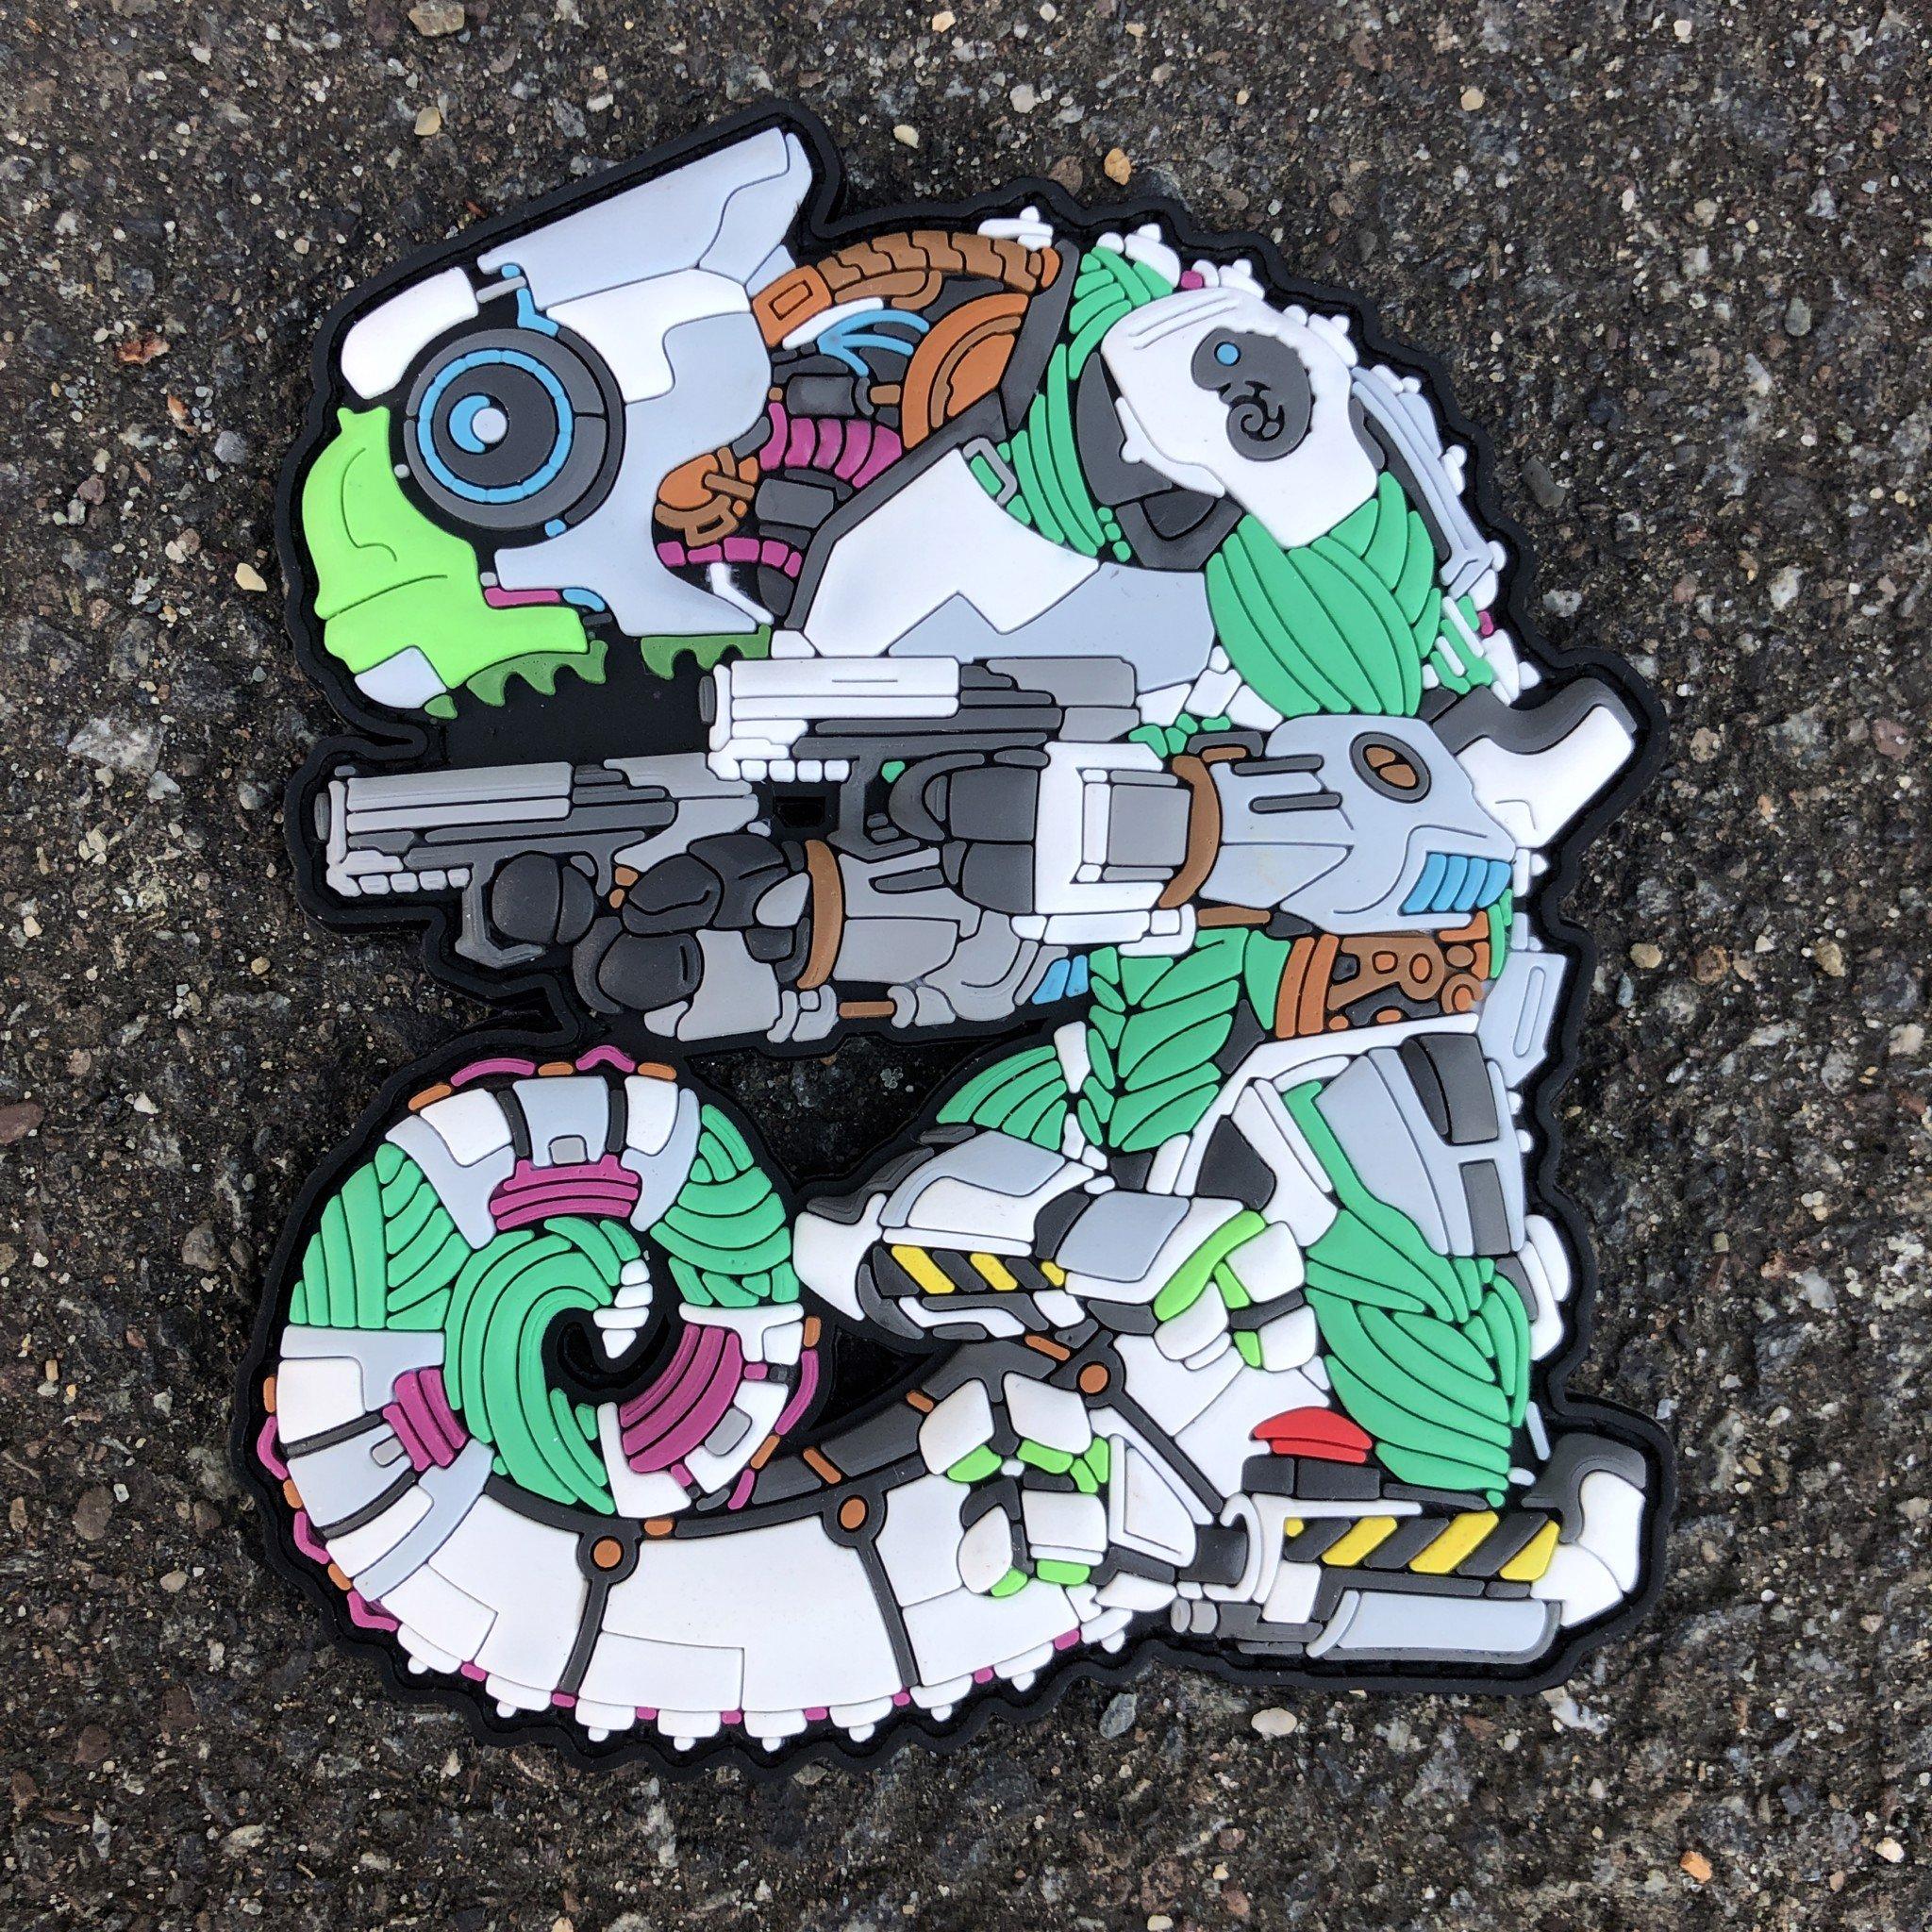 Tacopsgear Chameleon Legion Cham Cyborg BORG THE SHELL patch